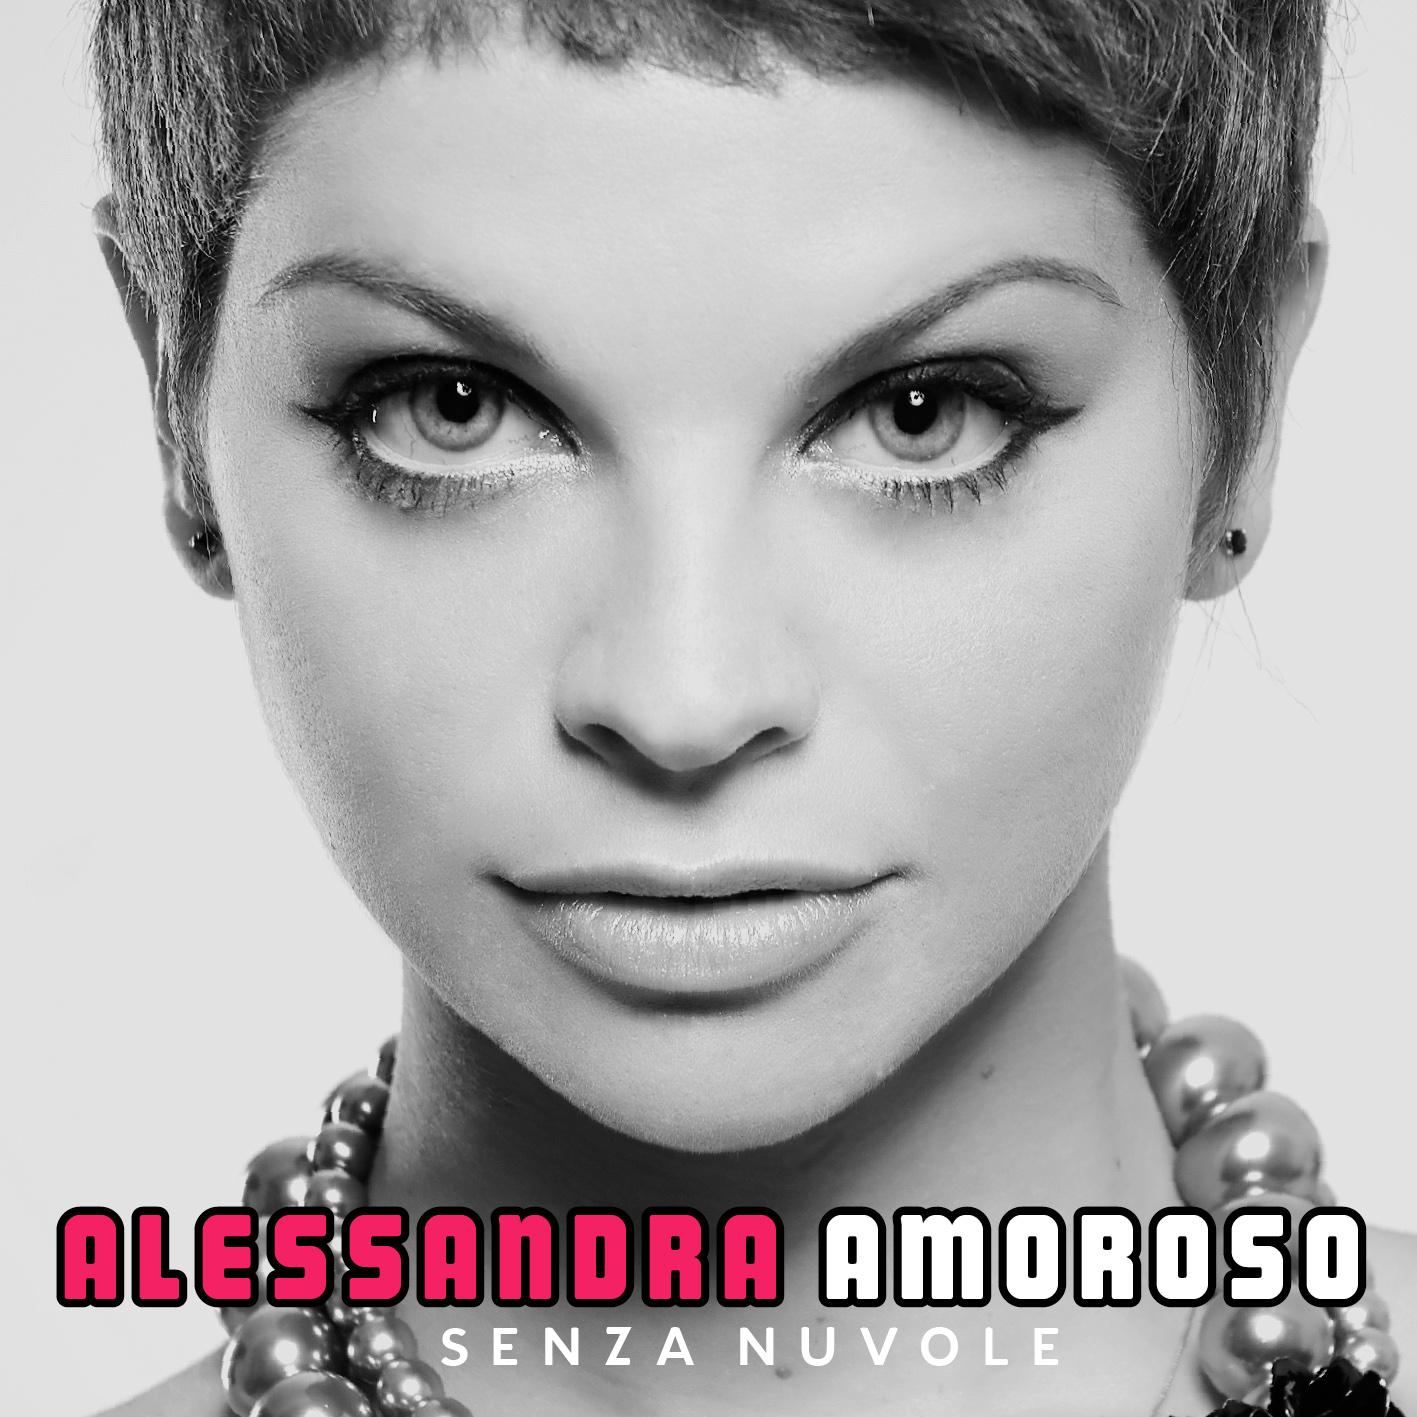 Arrivi Tu - Alessandra Amoroso: Testo (lyrics), traduzione e video